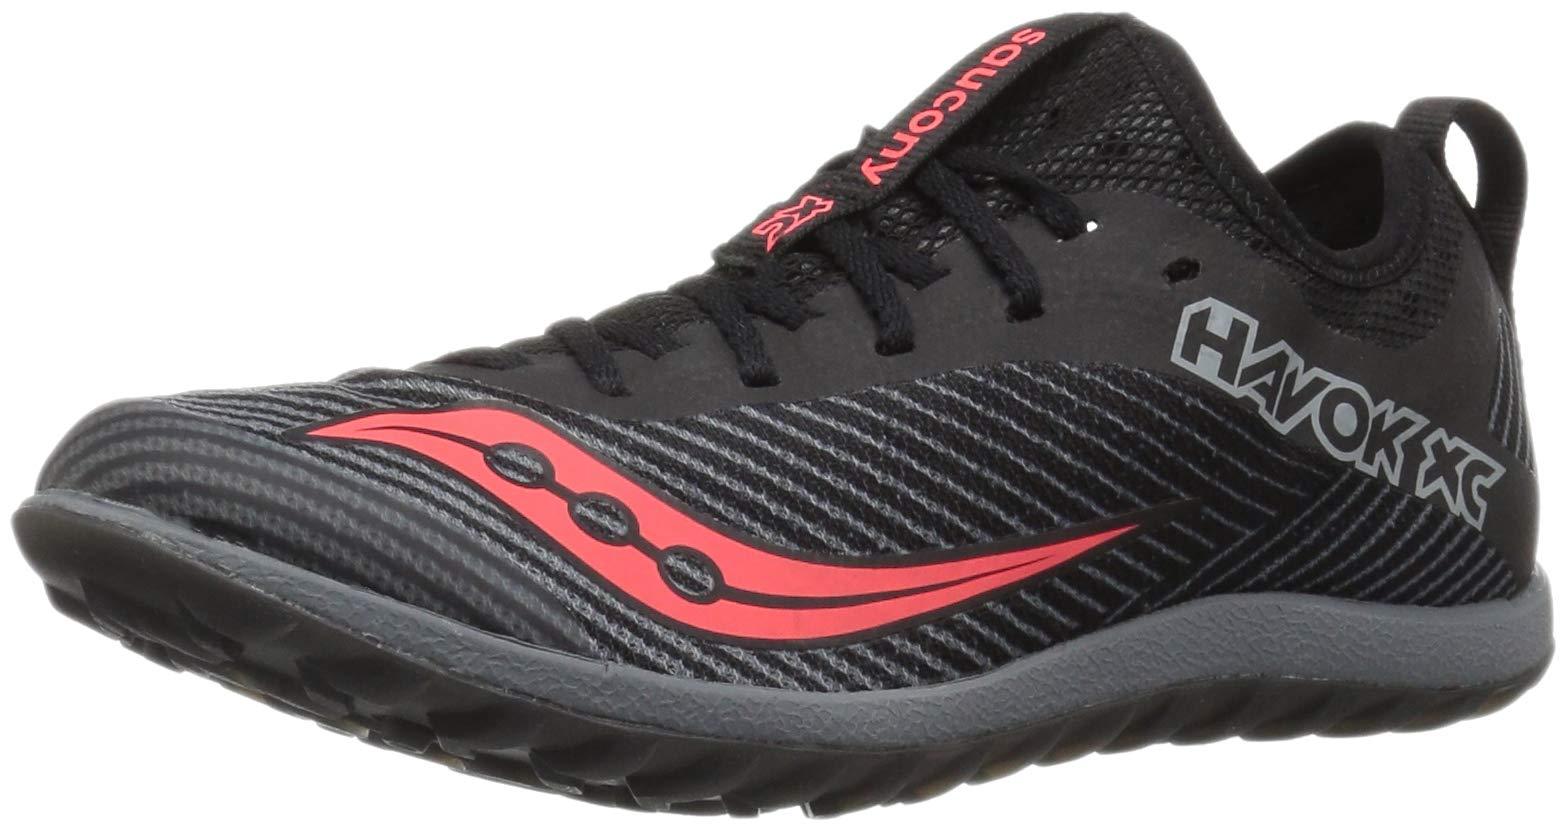 Saucony Women's Havok XC2 Flat Cross Country Running Shoe, Black/Grey/ViziRed, 5 M US